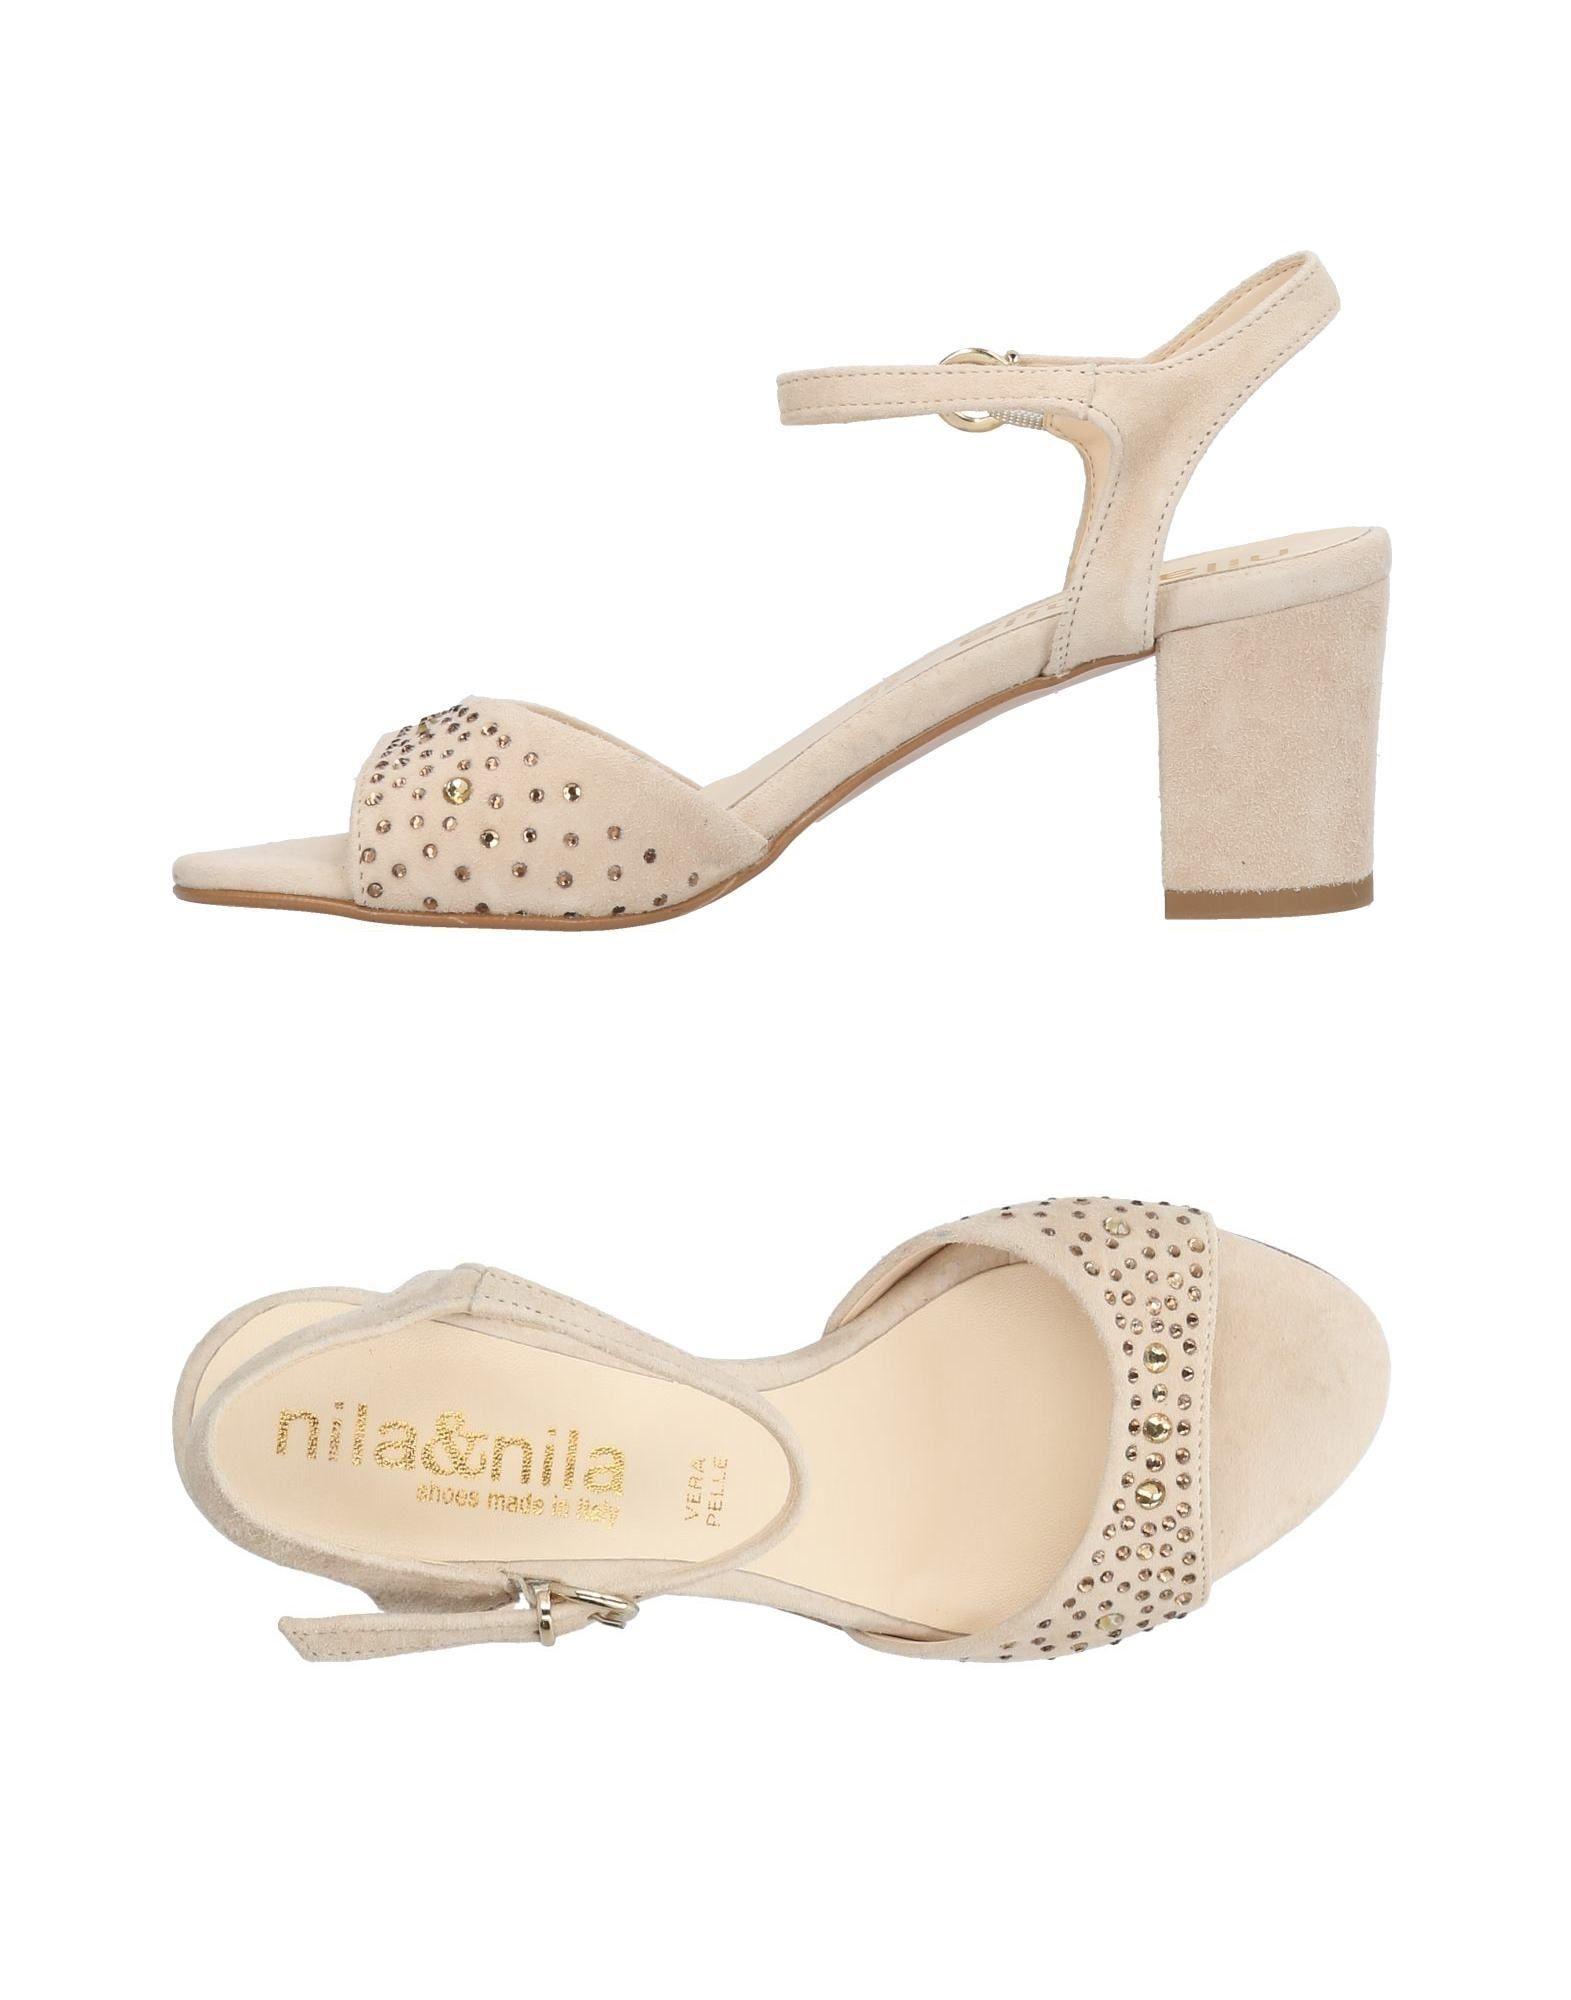 Nila & Nila Sandalen Damen  11443382QI Gute Qualität beliebte Schuhe